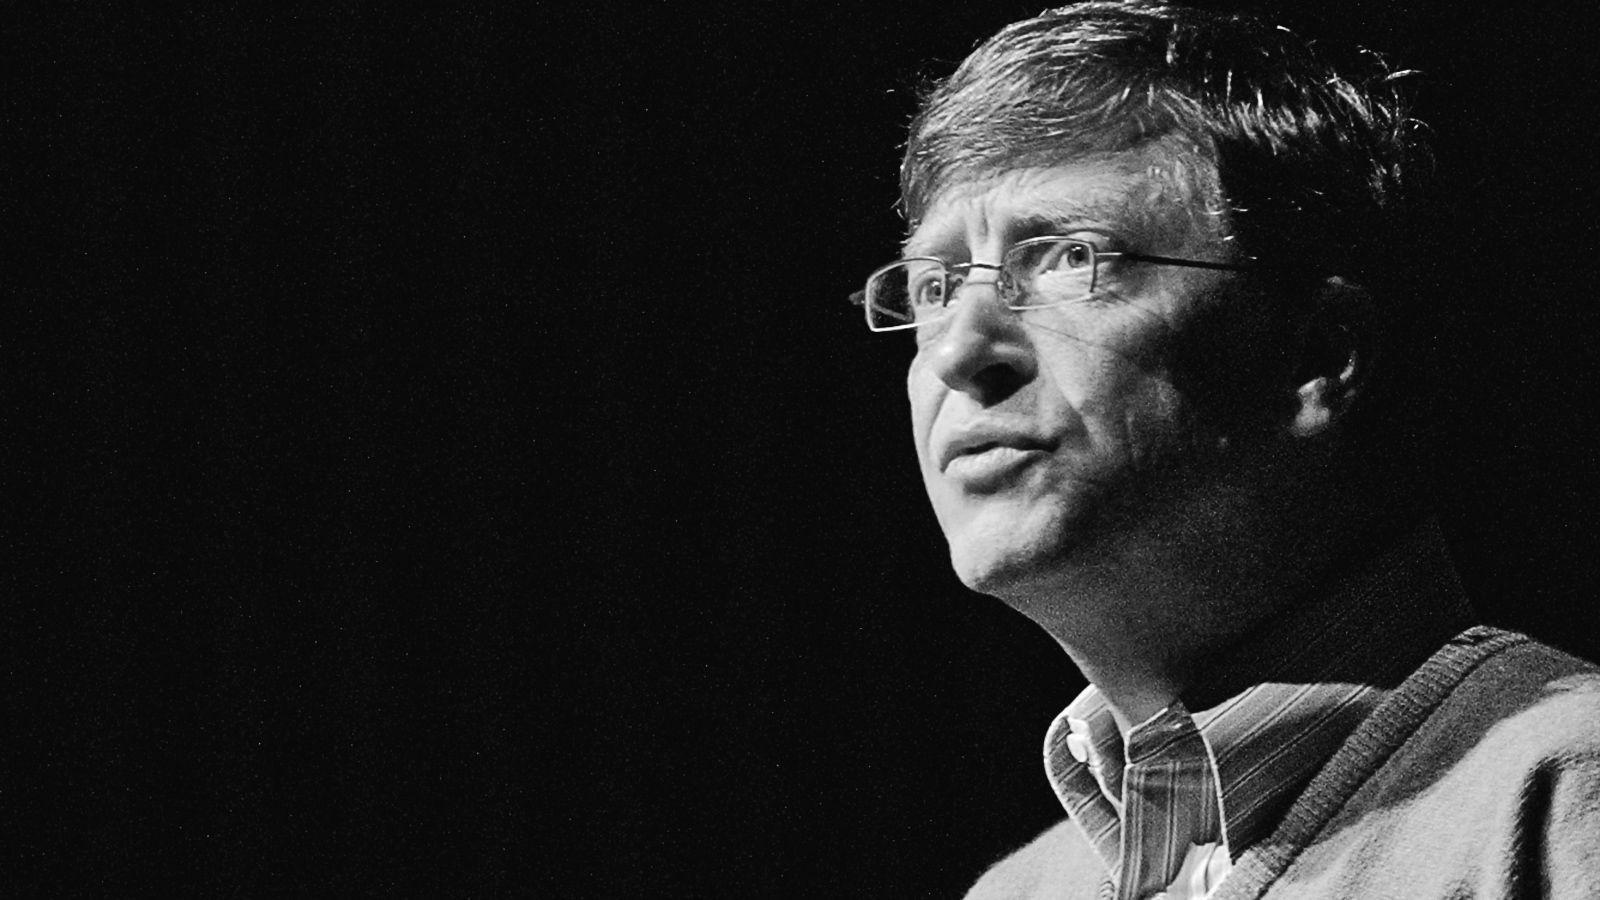 Philanthropist and inventor Bill Gates paid $80 million to kick start a a smart city.